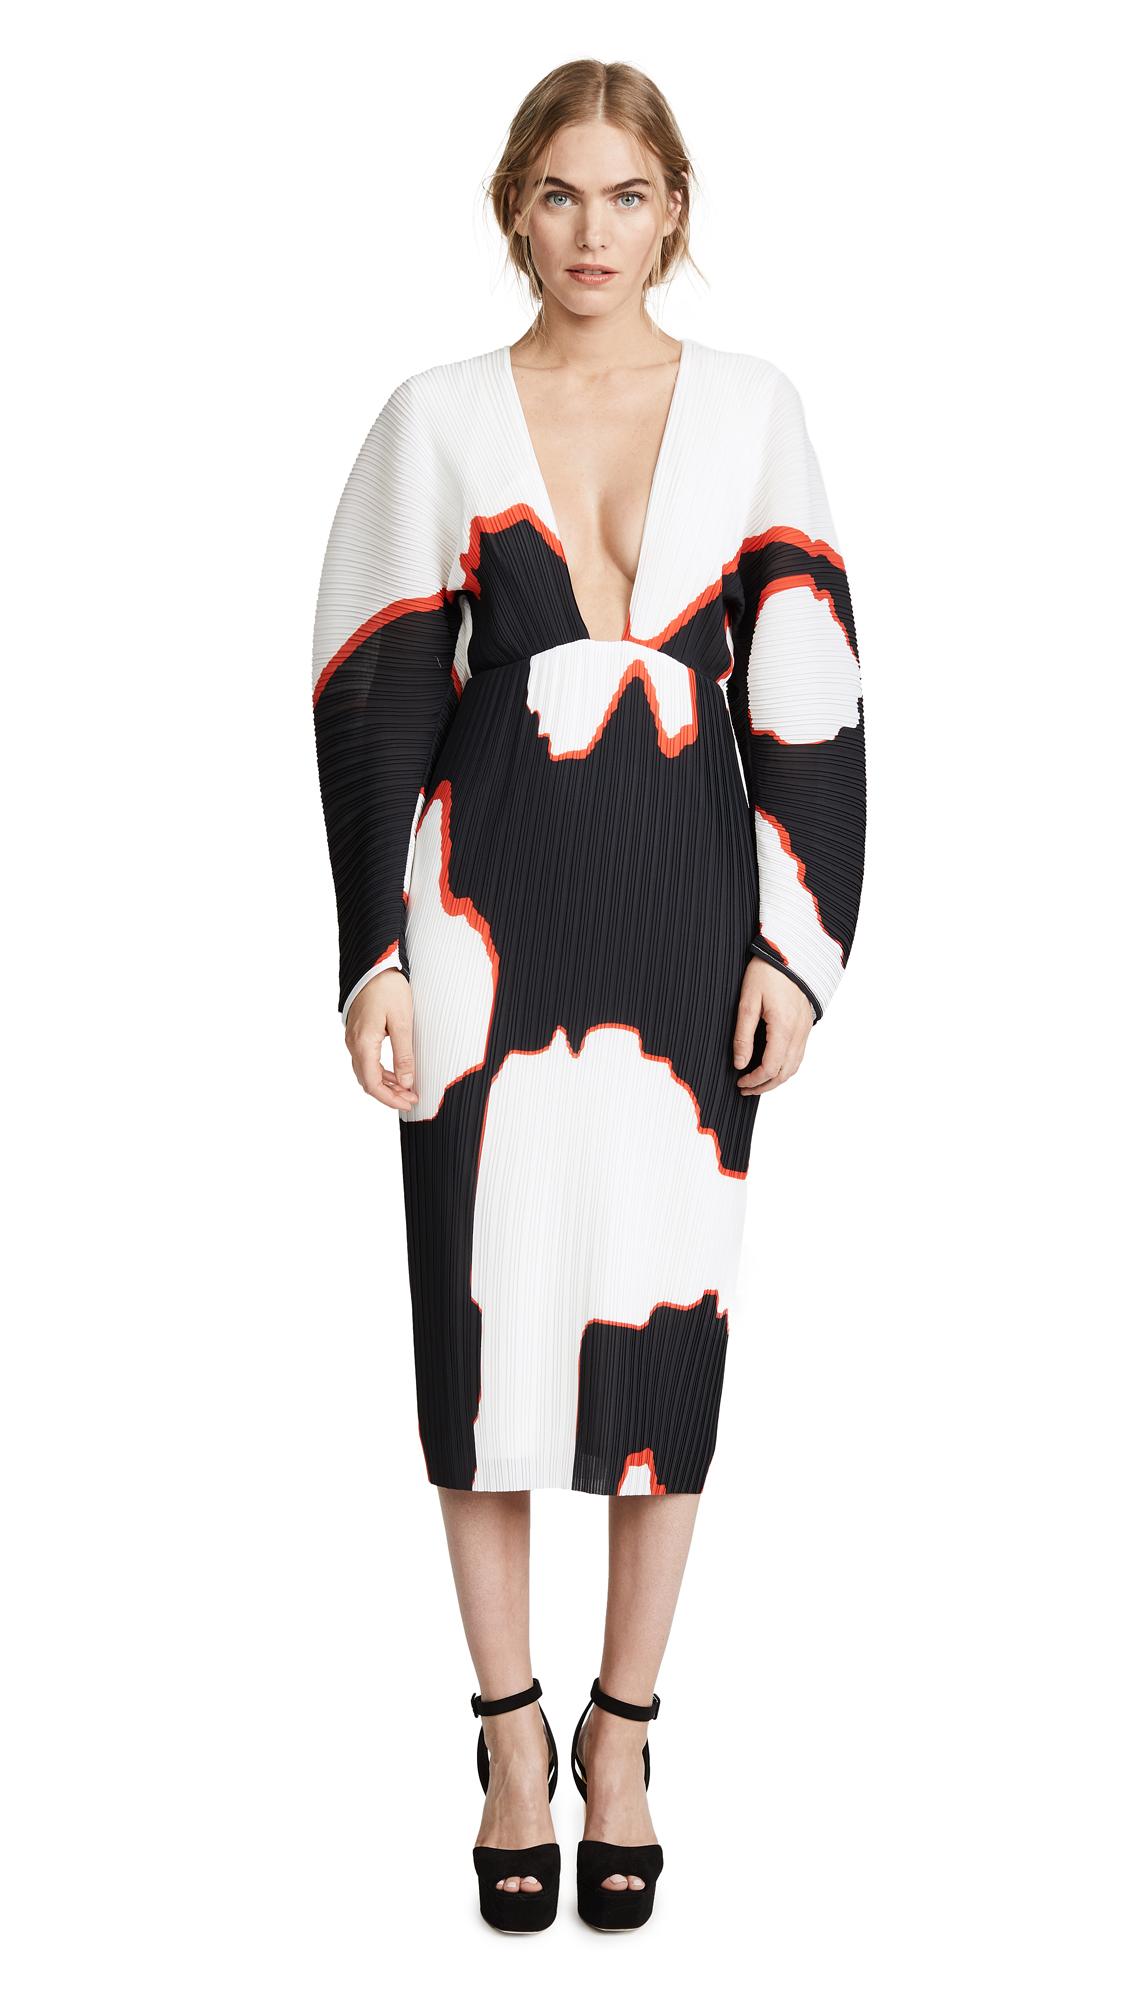 Solace London Phillipa Dress